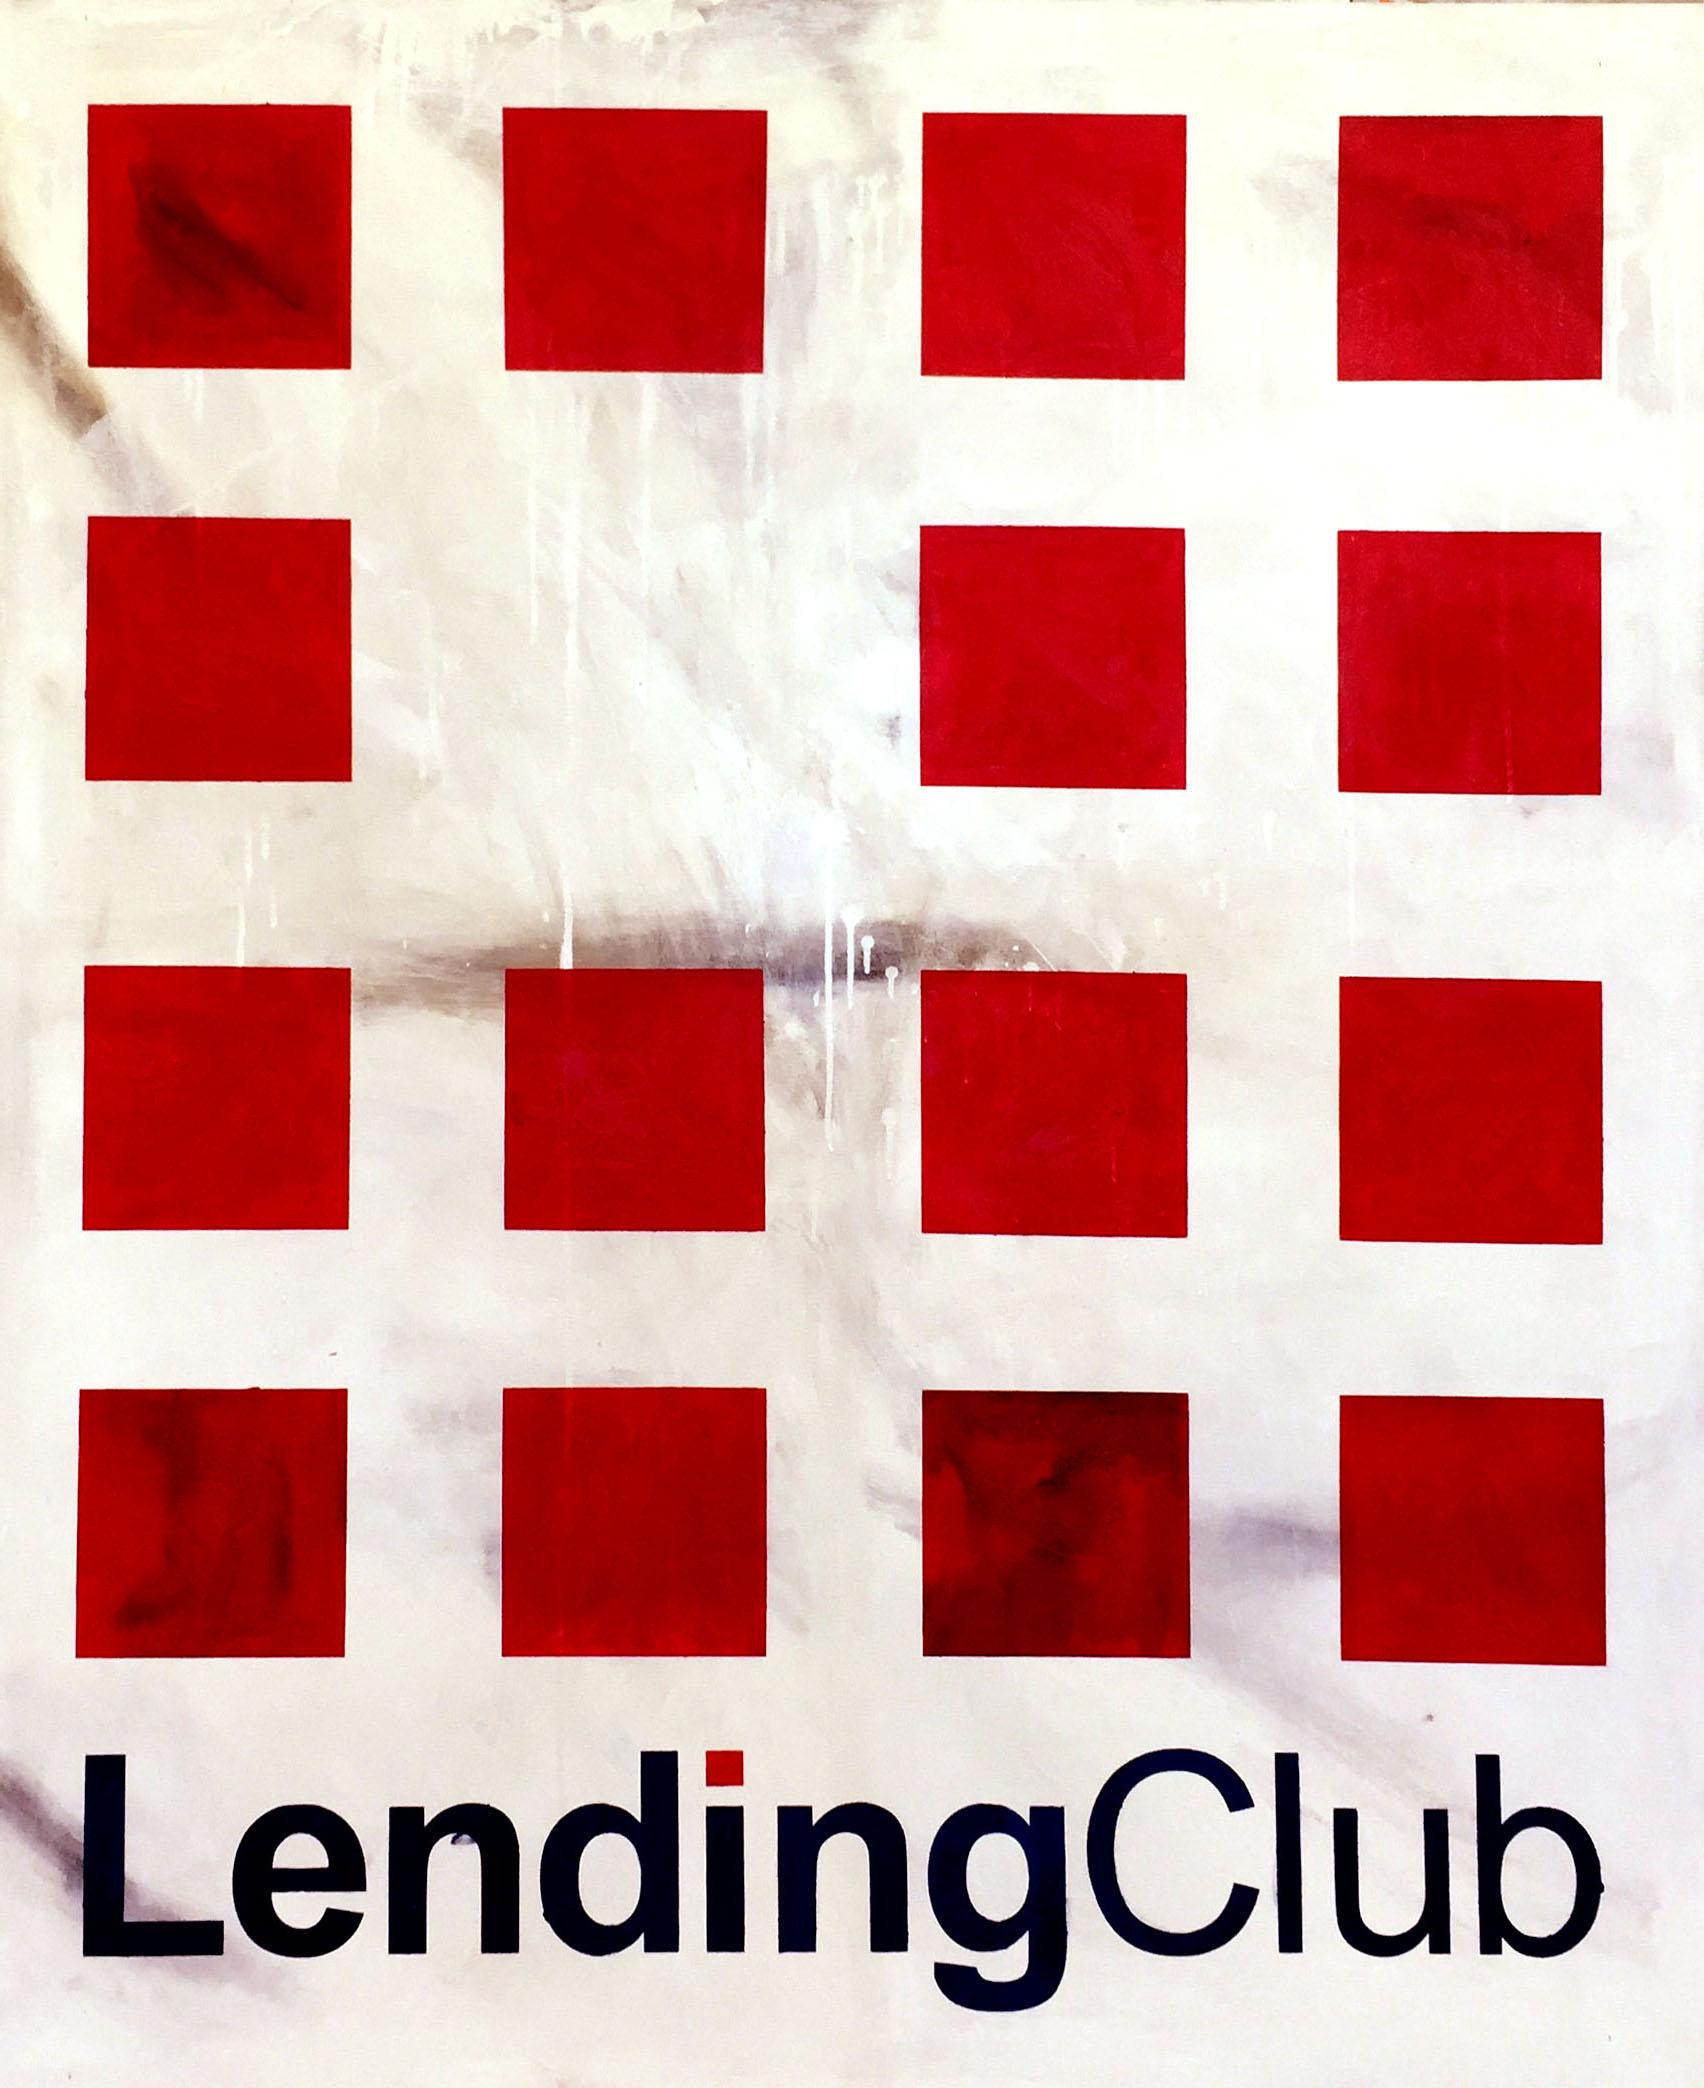 lending_club.jpg